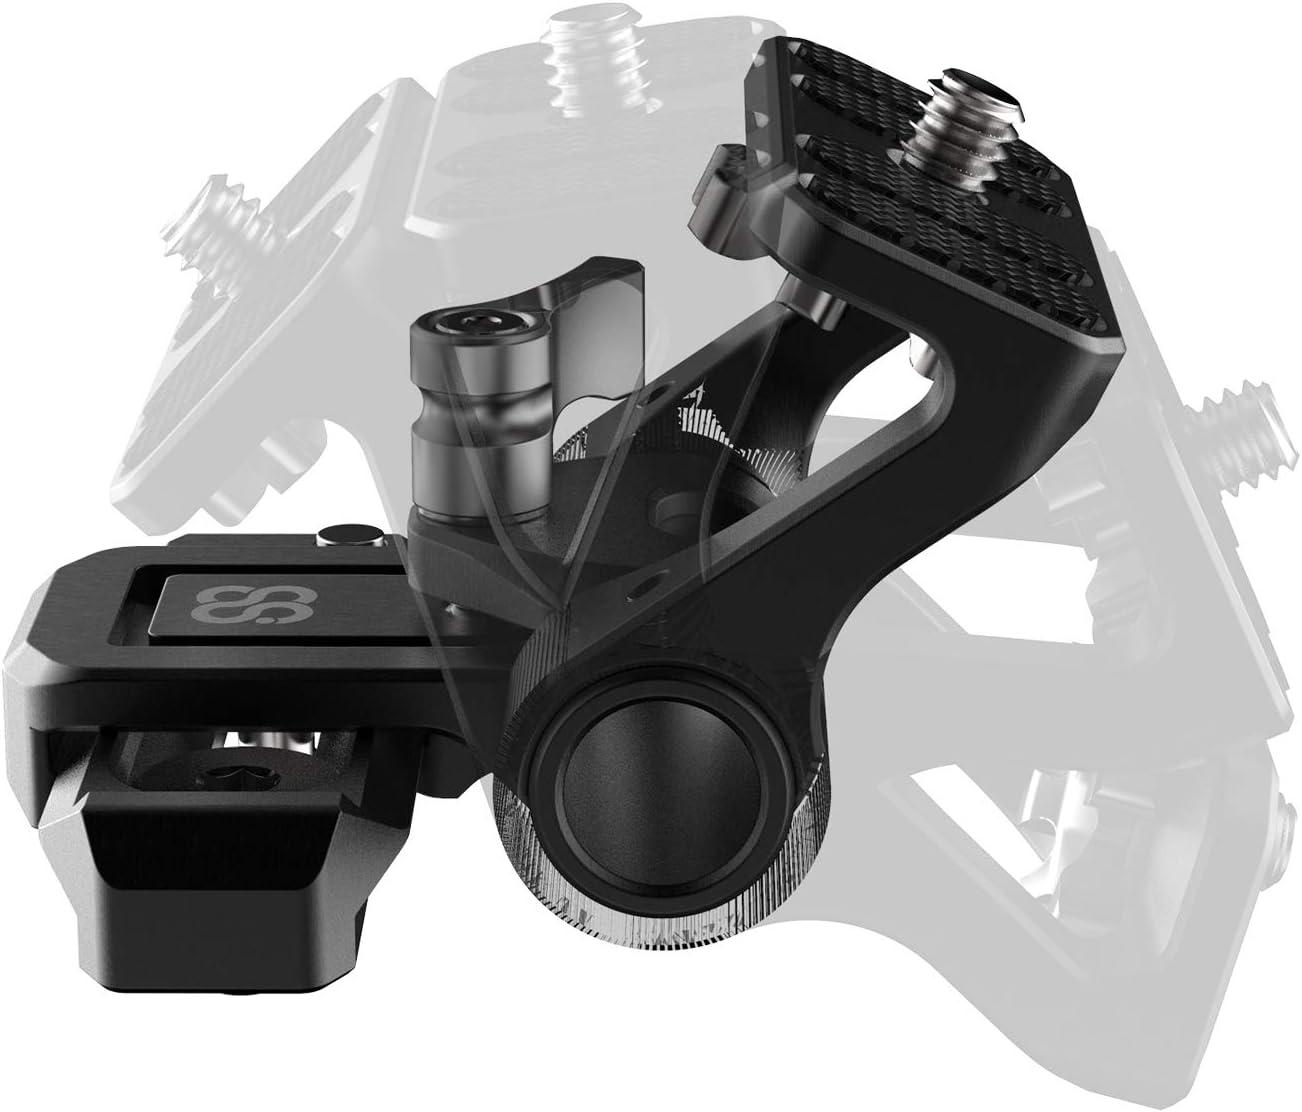 8Sinn Monitor Holder and 60mm Safety NATO Rail